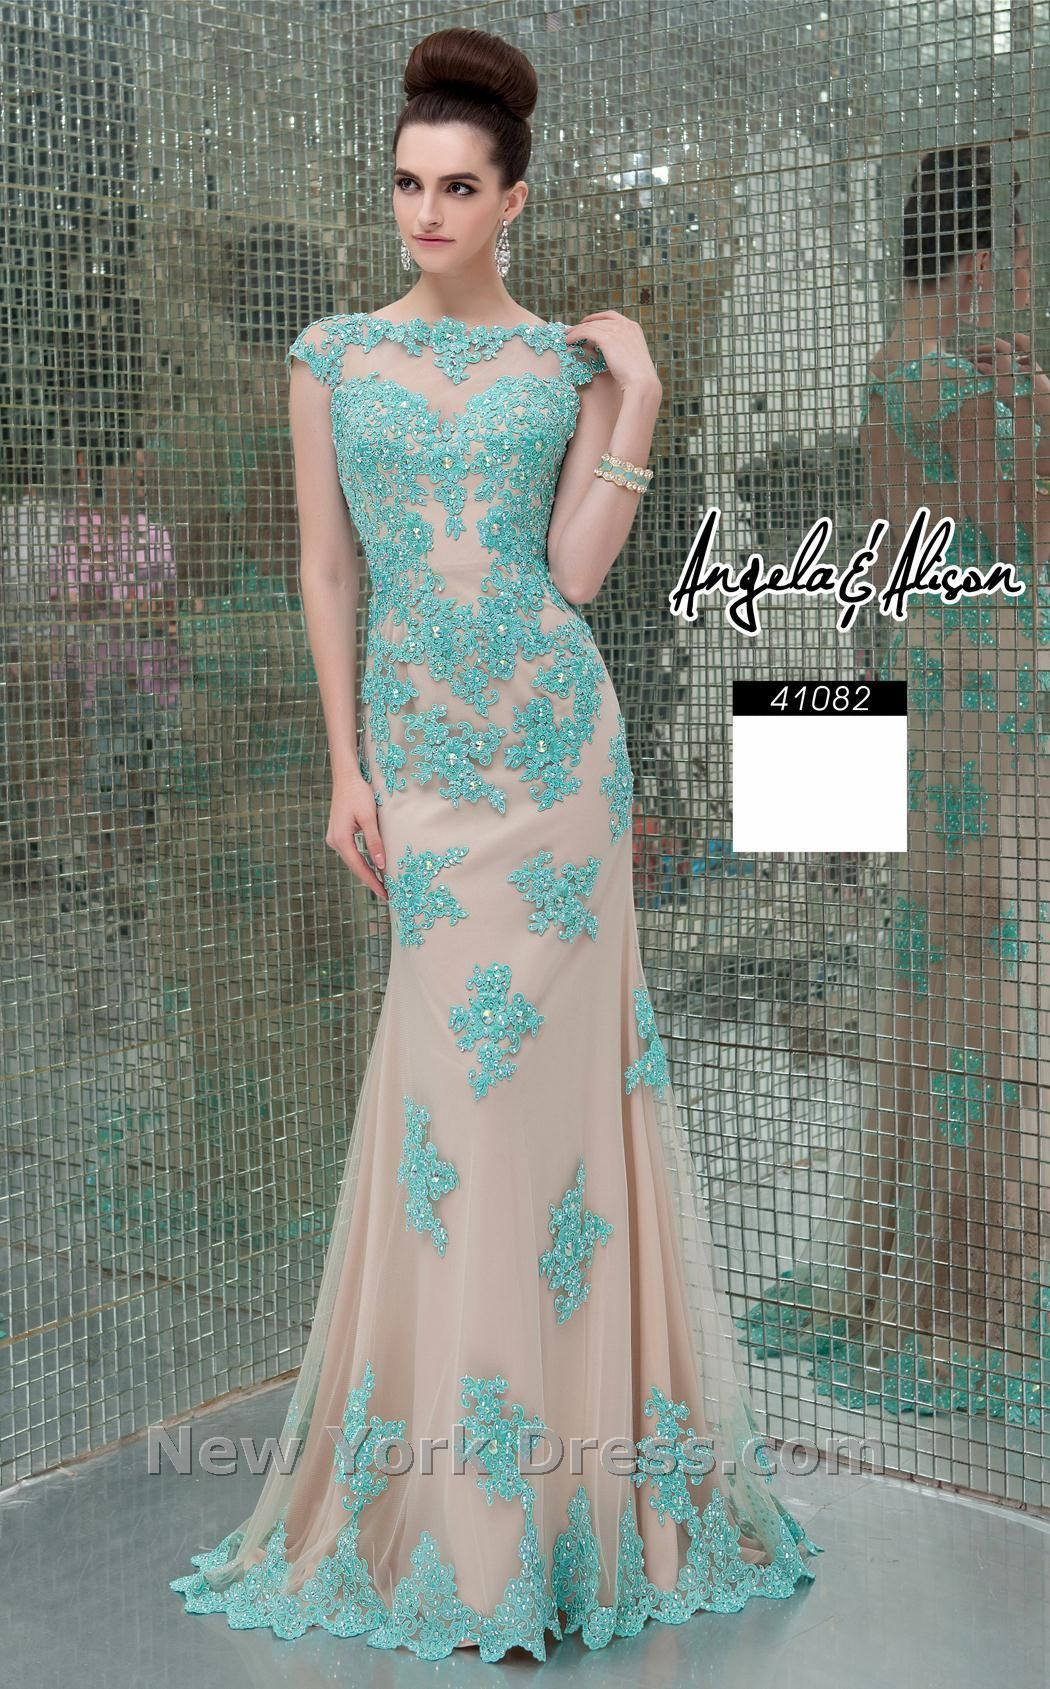 Angela and Alison 41082 Dress - NewYorkDress.com | inspiration art ...